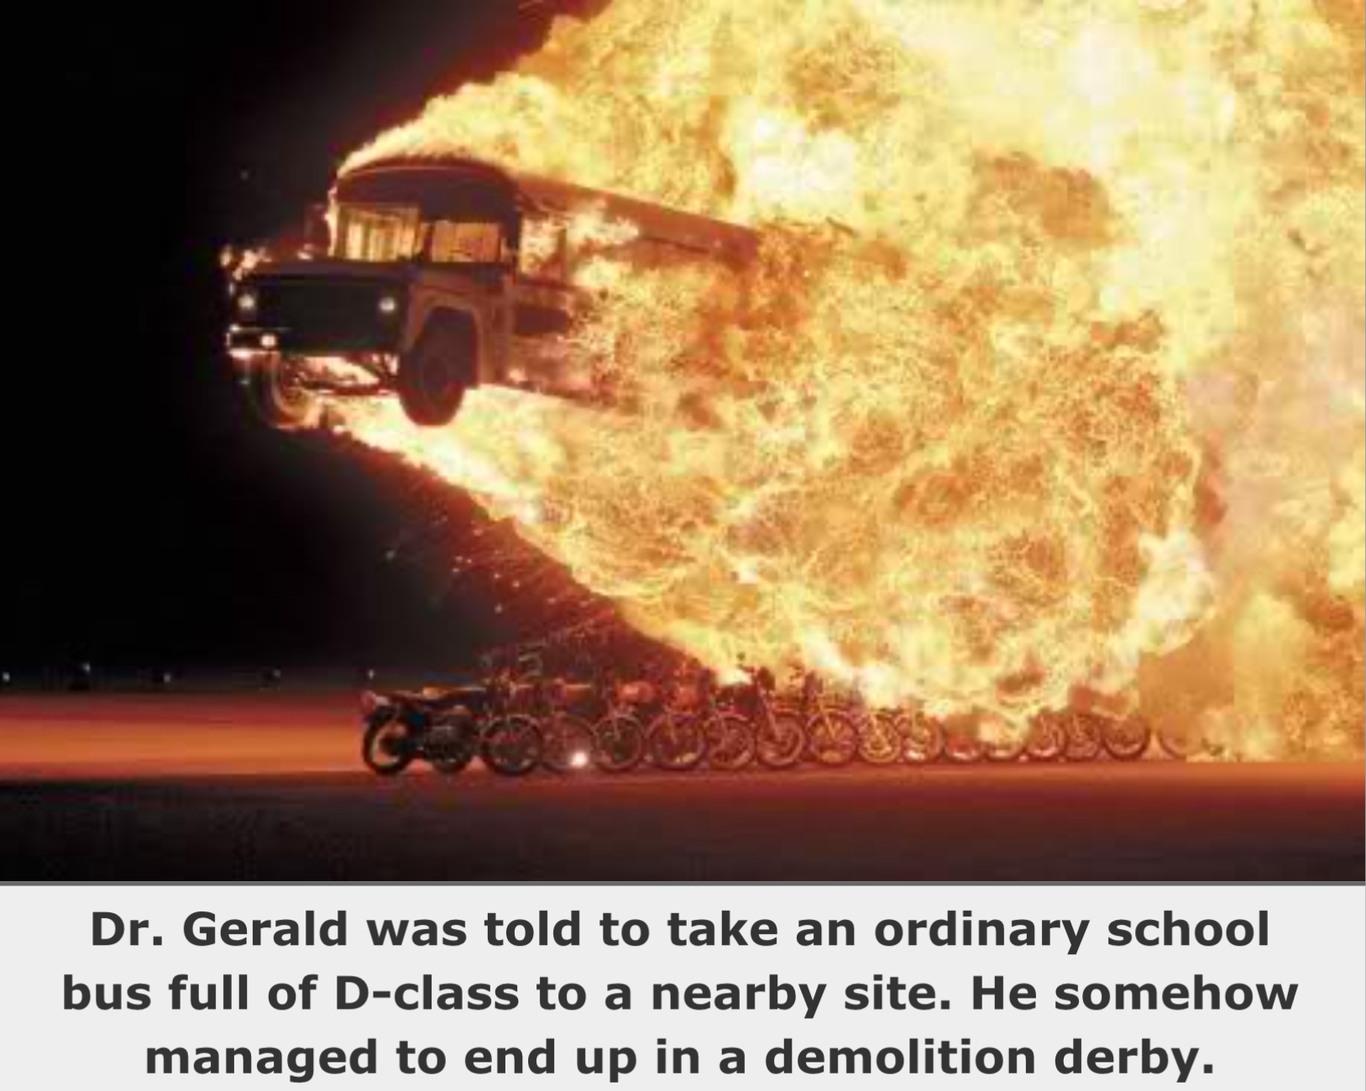 SCP-666-J: Dr. Gerald's Driving Skills - meme